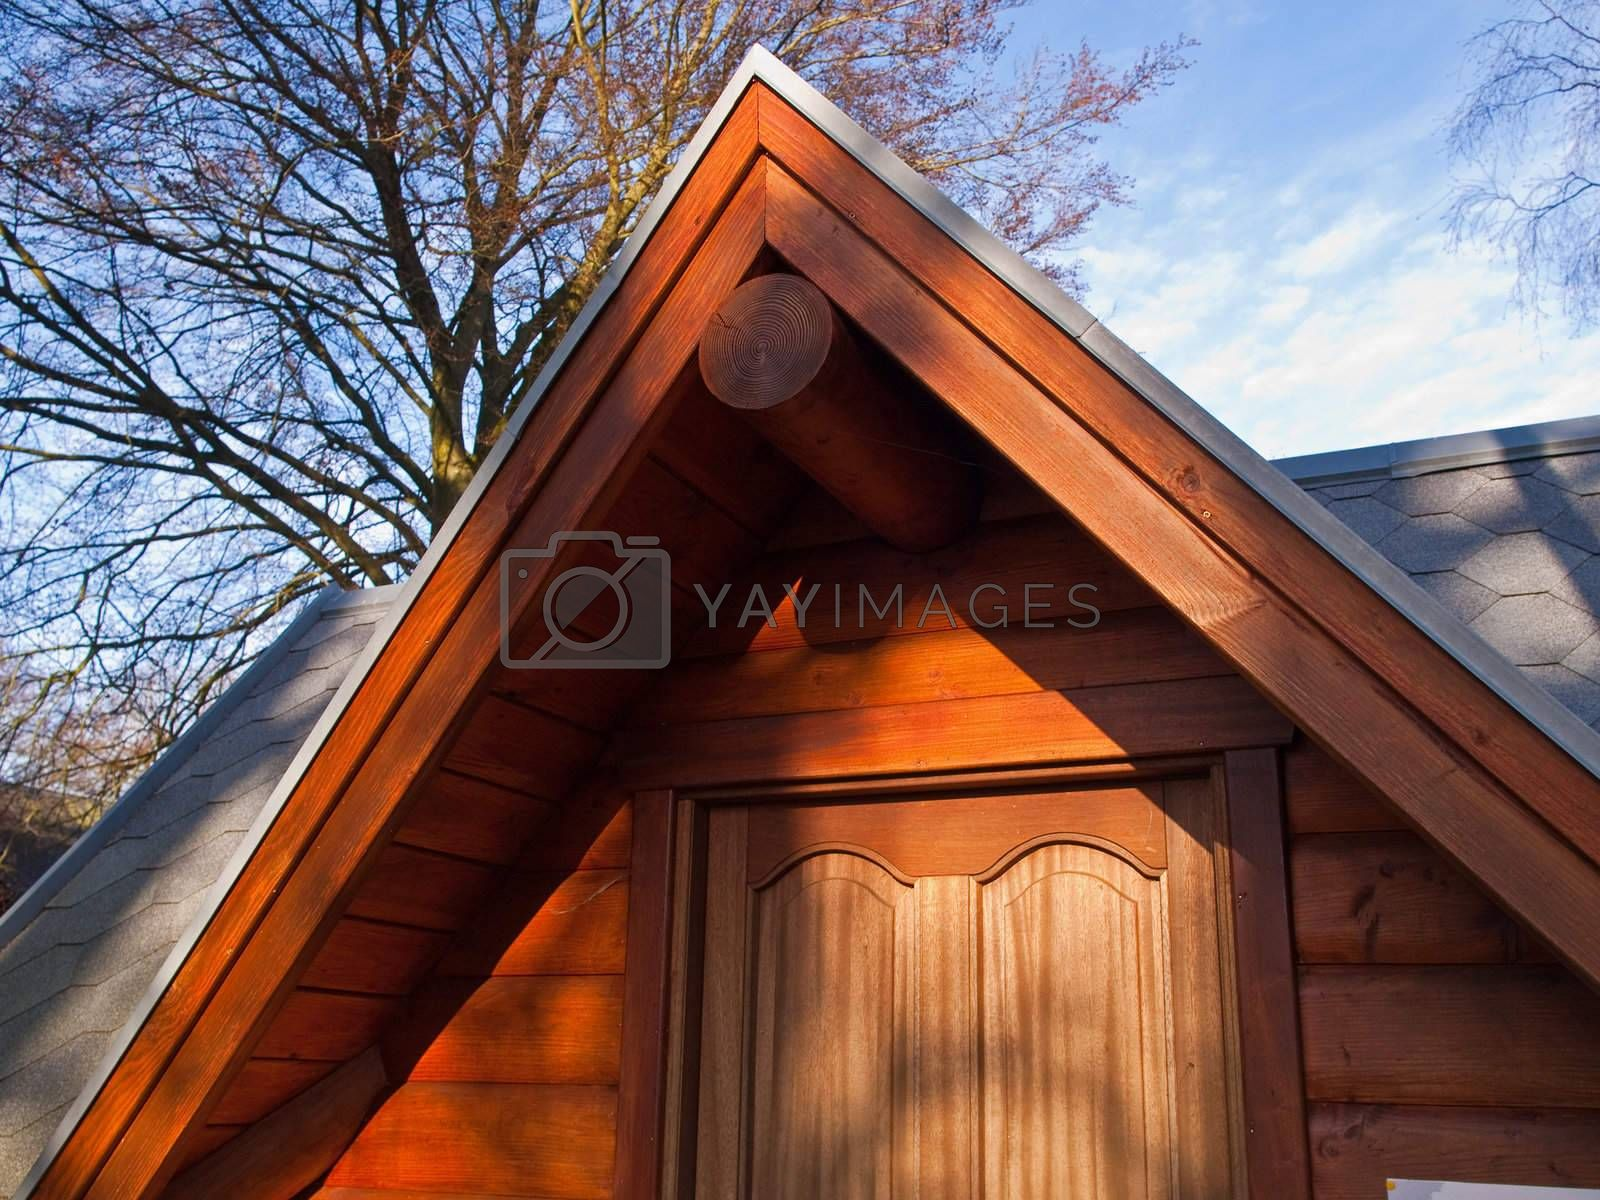 Details of a Swiss Alps winter wooden chalet cabin